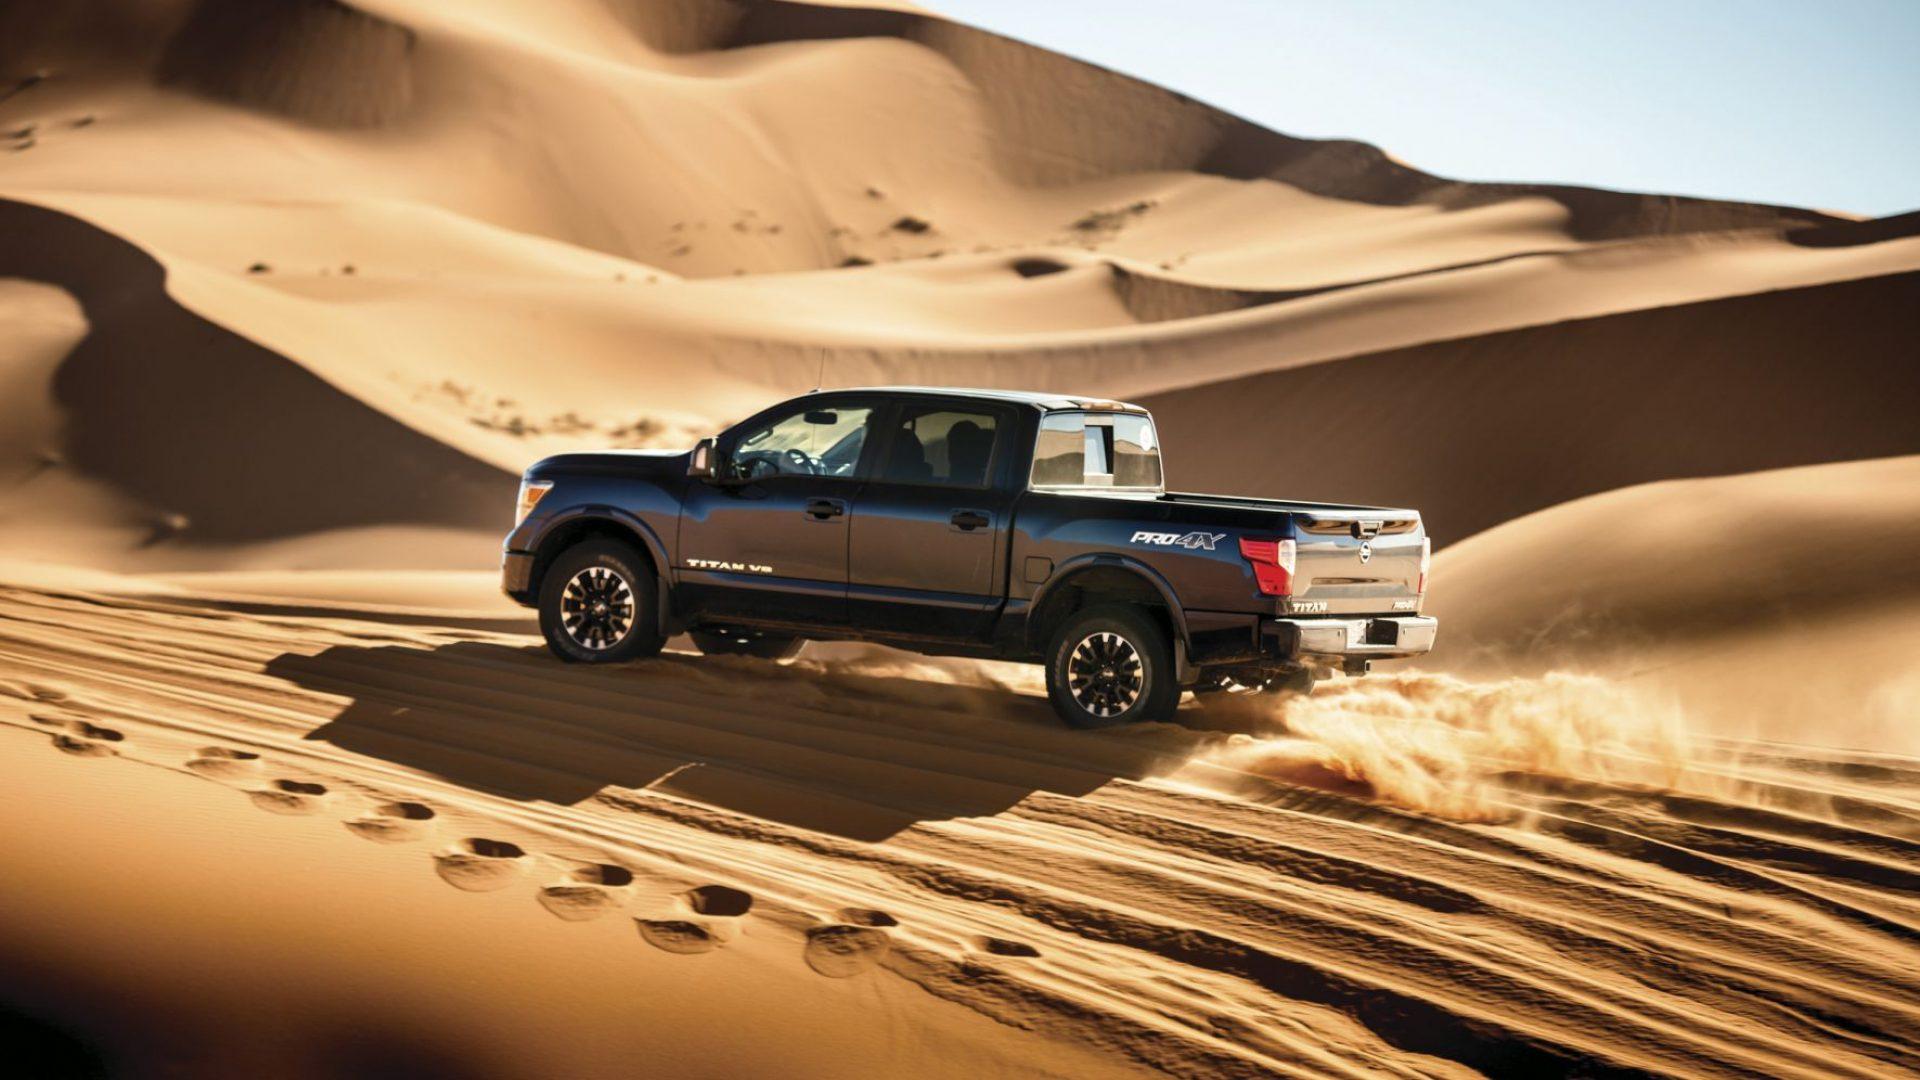 NissanMorocco_20181120_4J6A6679